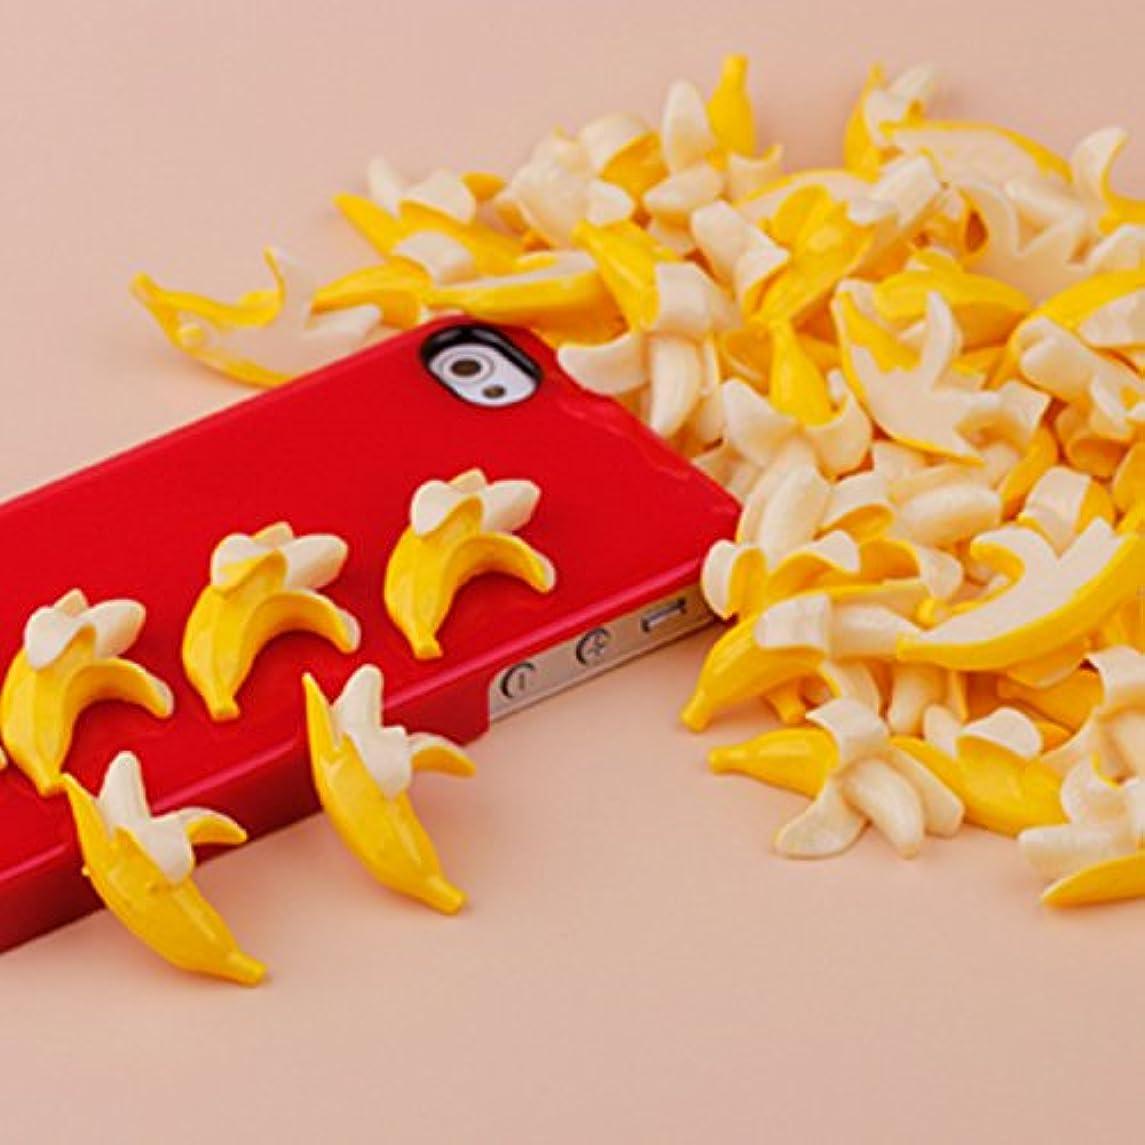 50 Pcs Resin Banana Mobile Phone DIY Accessories Scrapbooking Decoration xbhjeqljse0